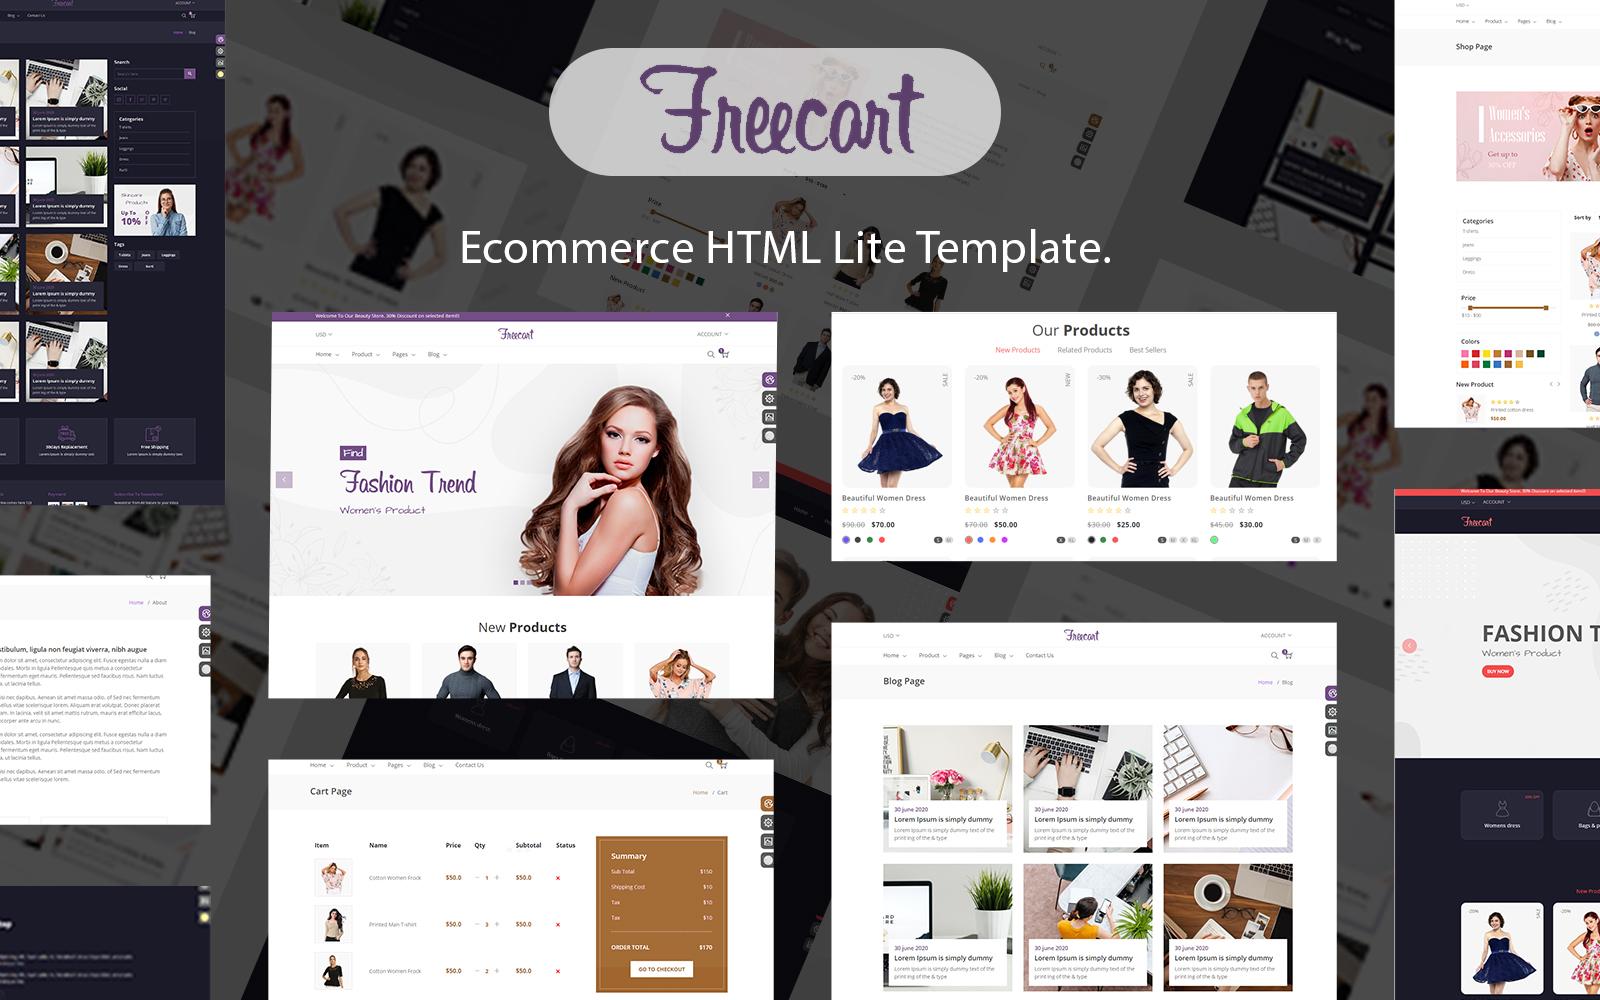 Free cart - Ecommerce HTML Multi Purpose Template.